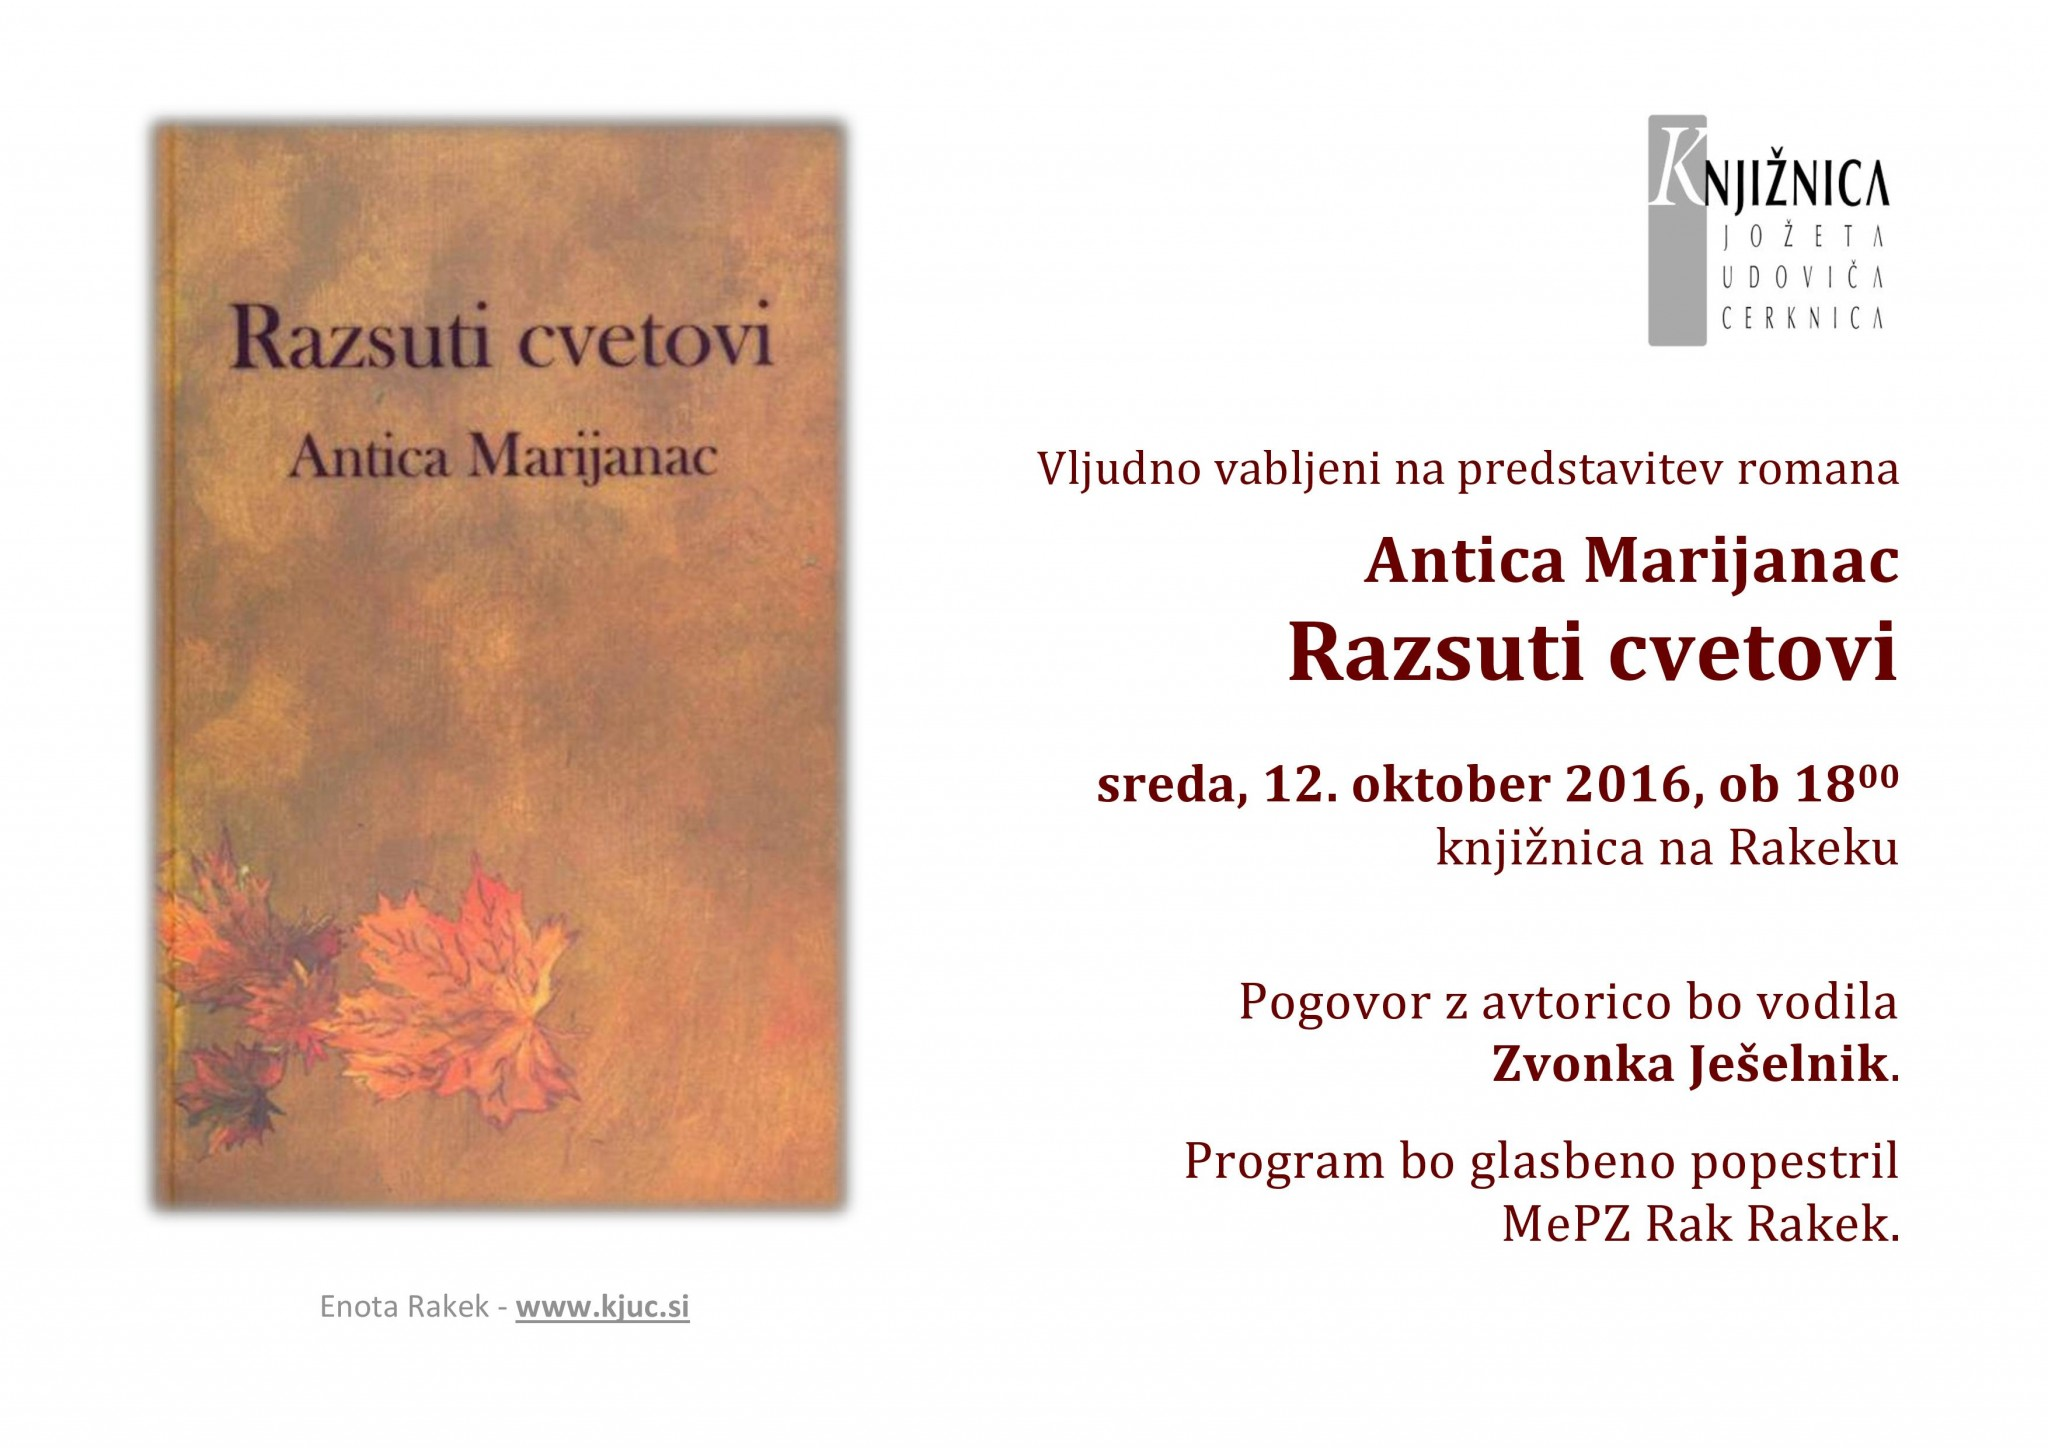 Antica Marijanac. 2016 page 001 - Antica Marijanac: Razsuti cvetovi